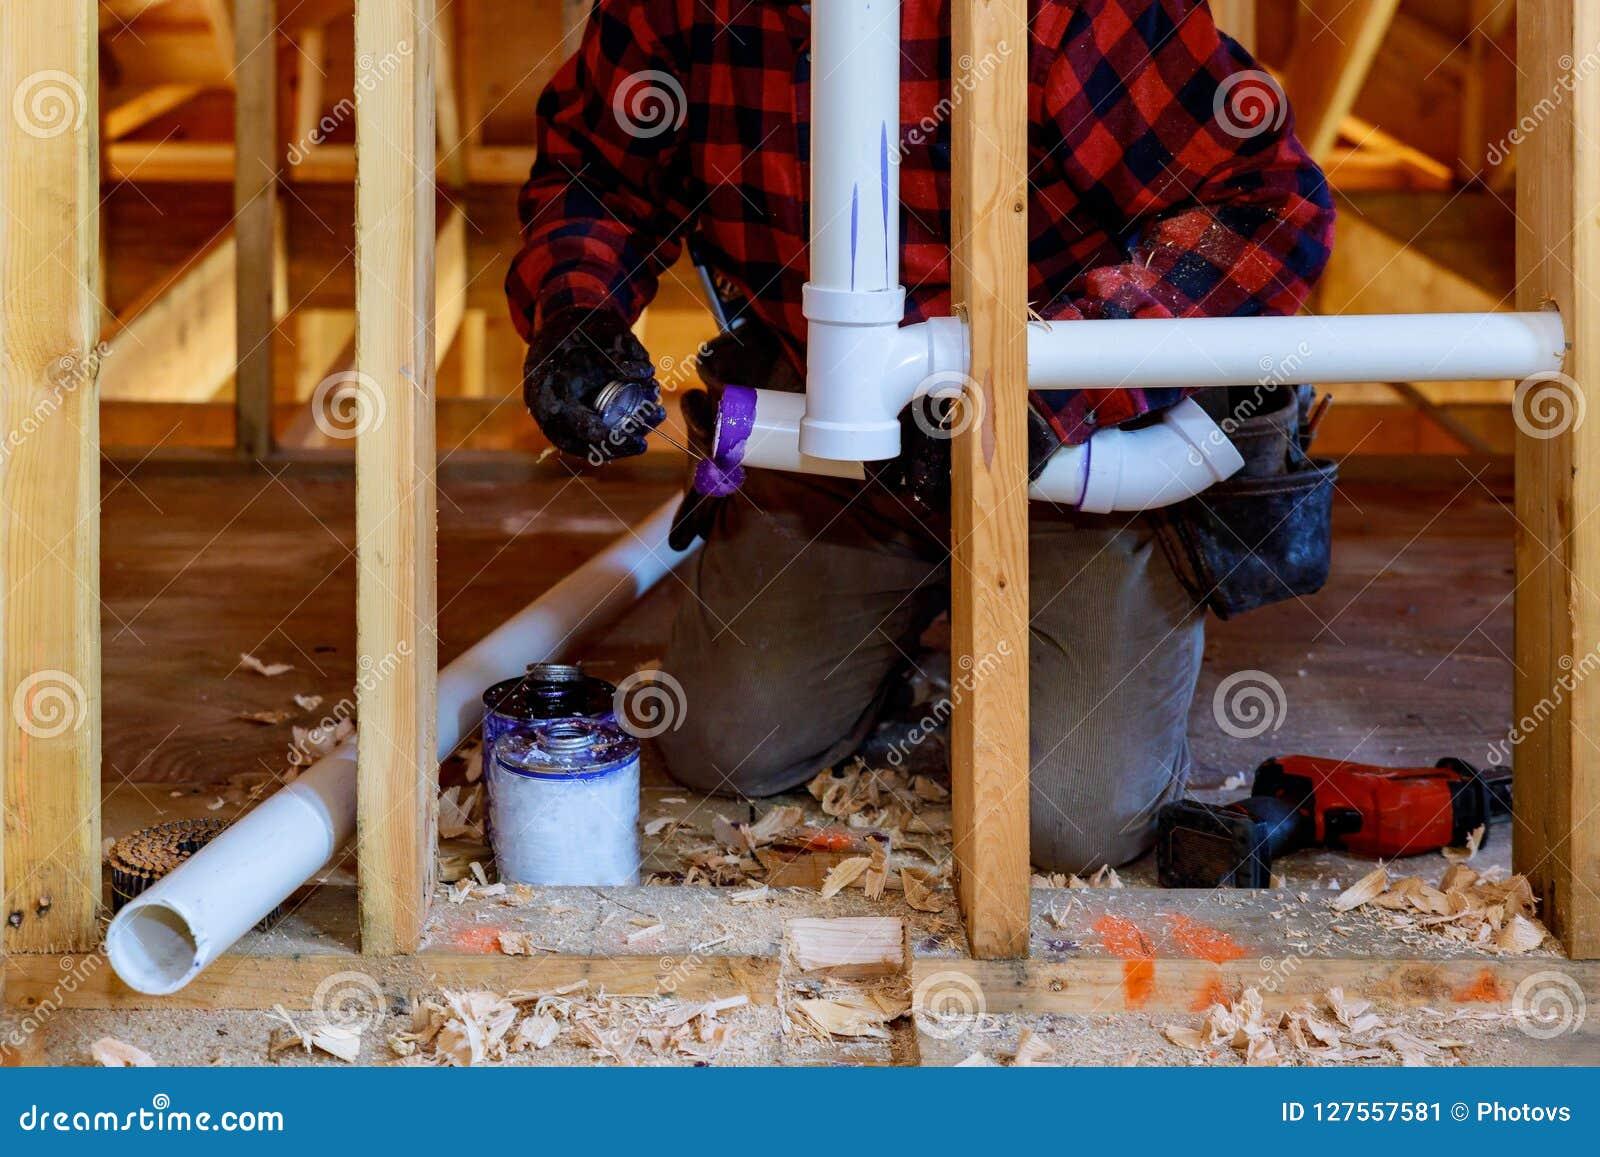 Plumbing Contractor Installing Plastic Pvc Pipe In Under The Bathroom Sink Stock Image Image Of Repair Pipeline 127557581